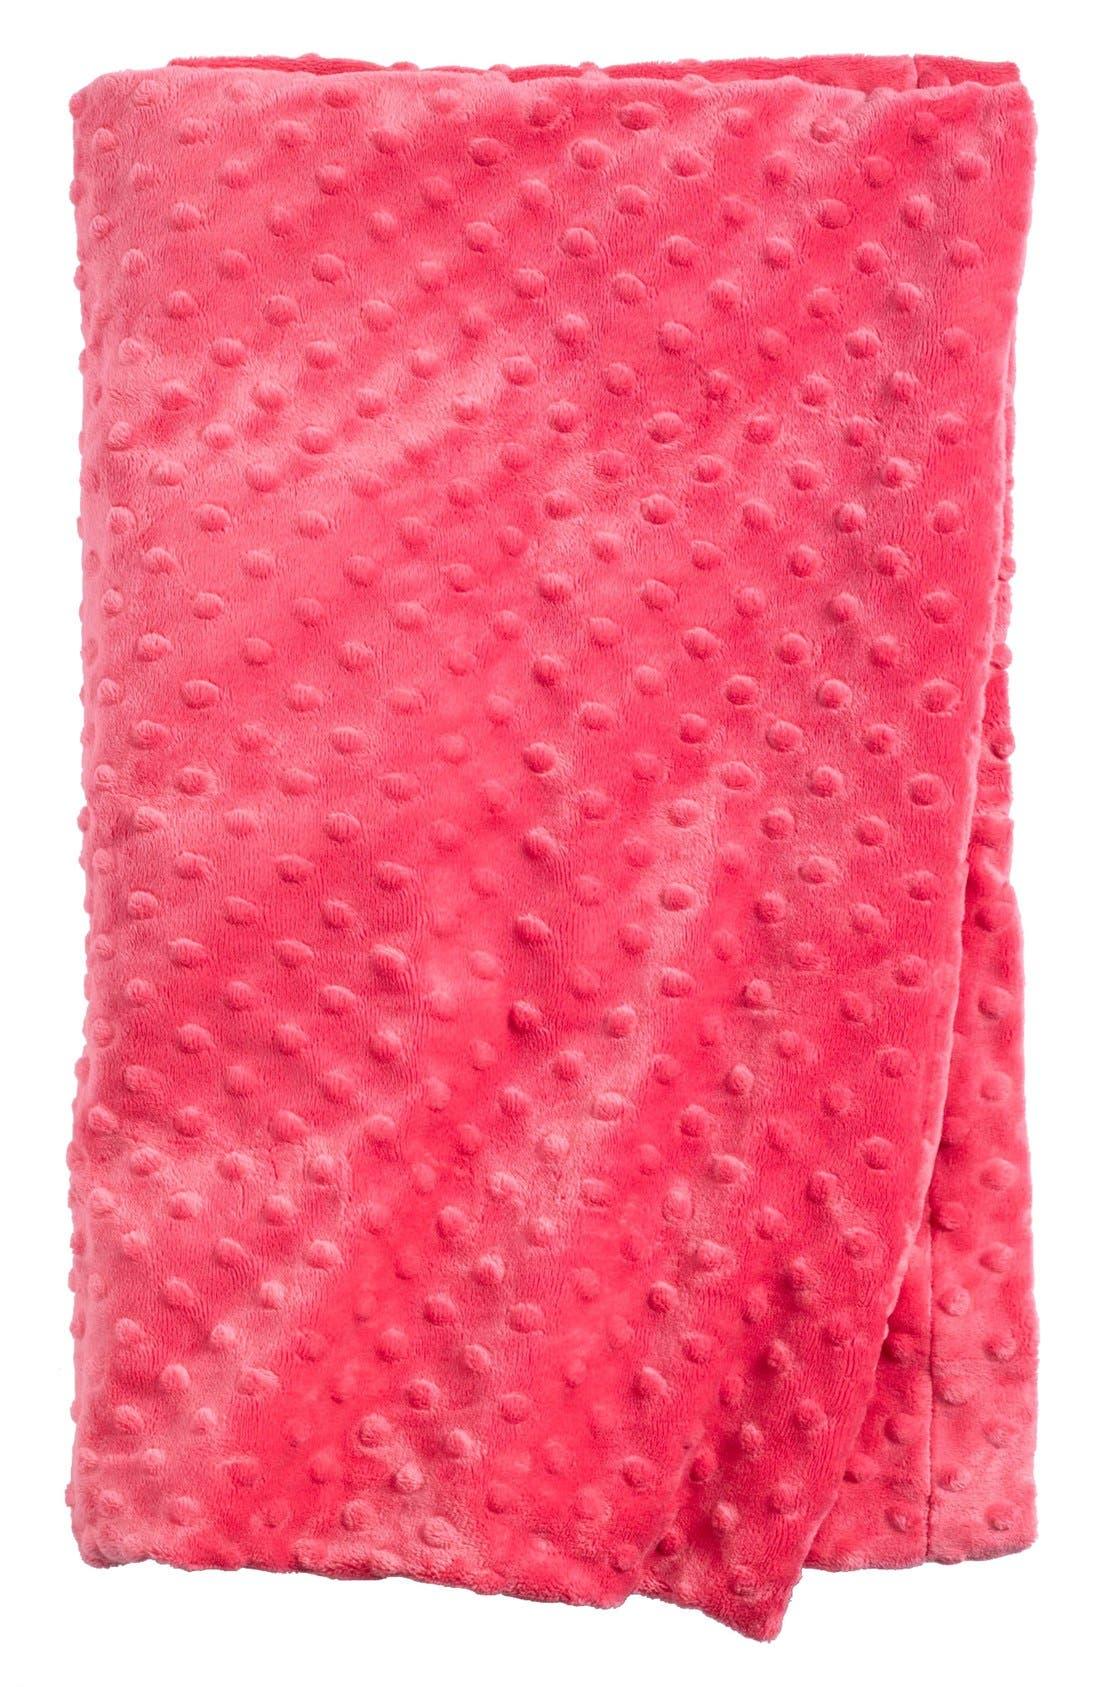 Alternate Image 1 Selected - Sonoma Lavender Hot Pink Dot Blankie (Nordstrom Exclusive) ($64 Value)